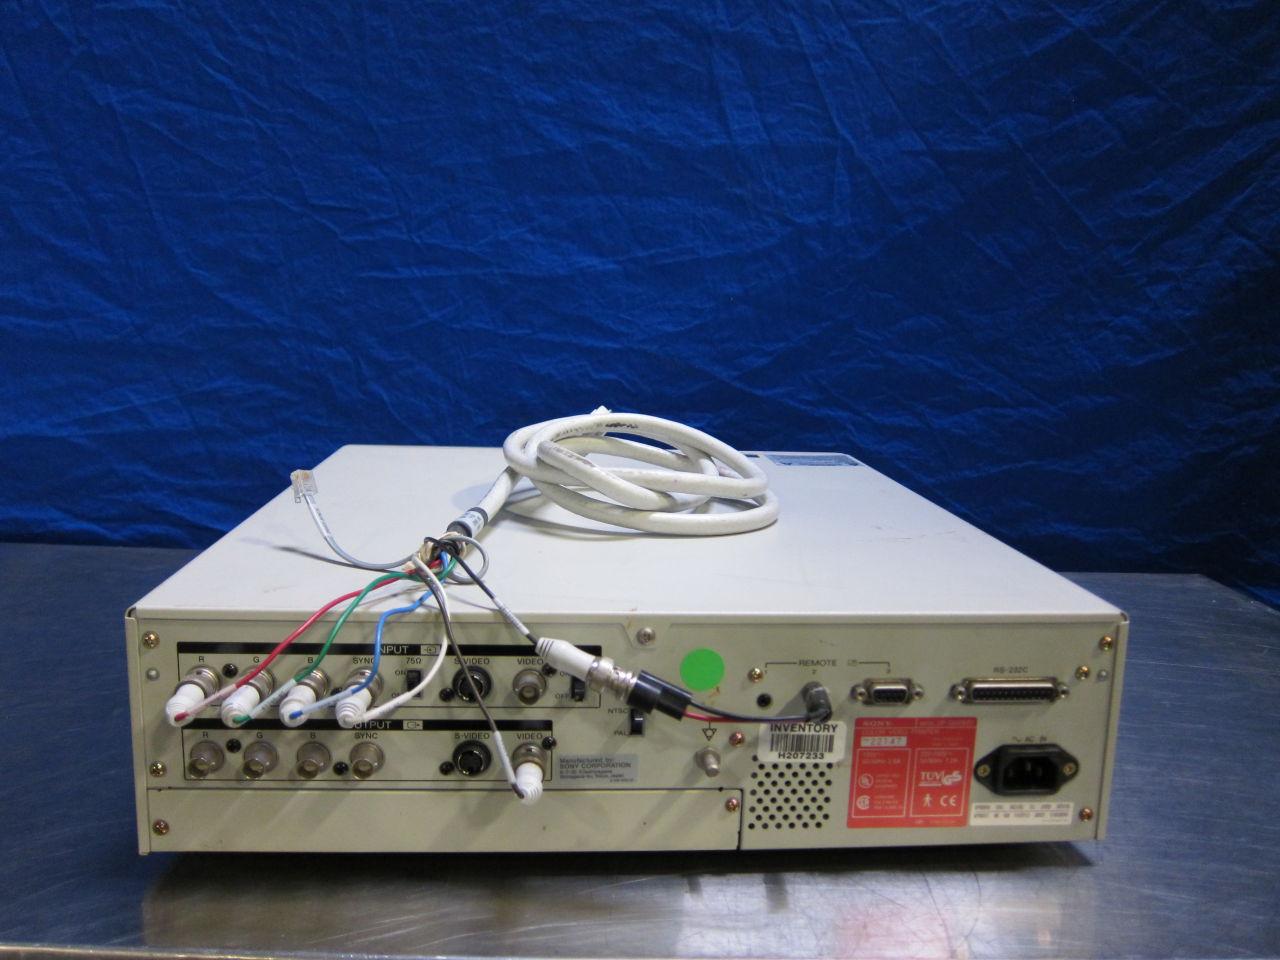 SONY Mavigraph / UP-5600MD Printer